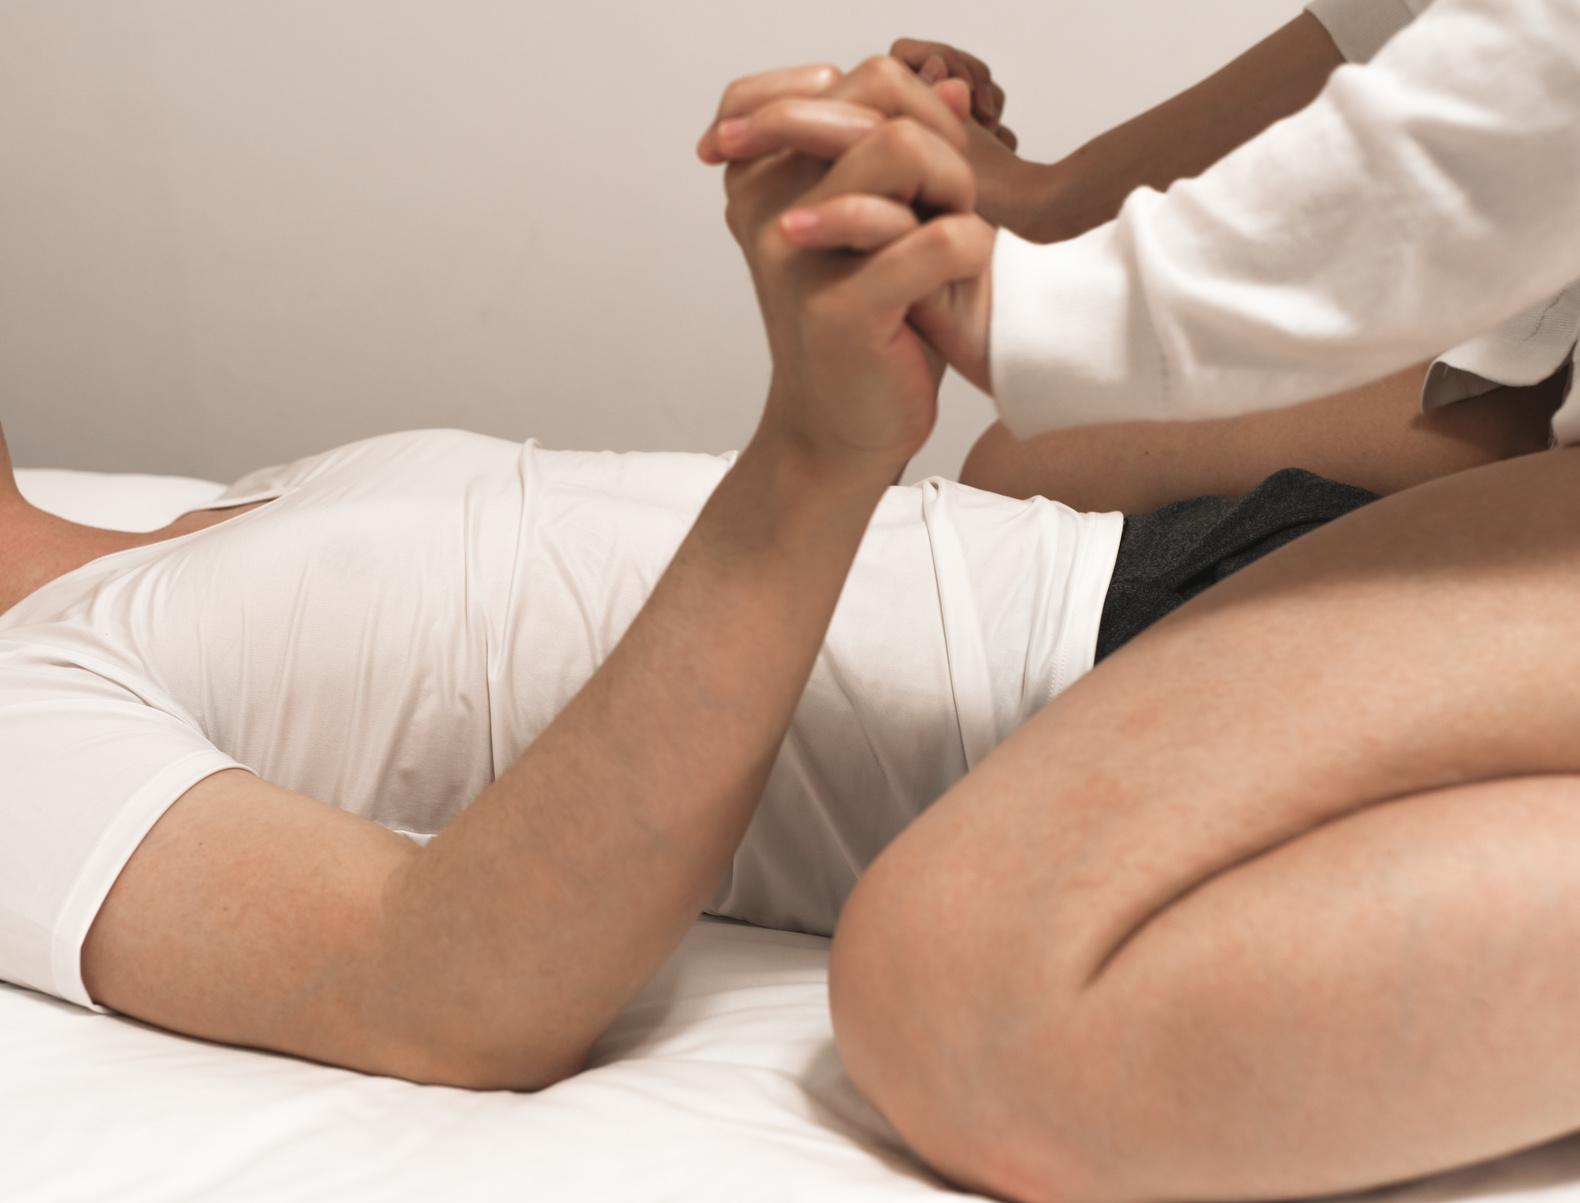 velike guze žene jašu penis